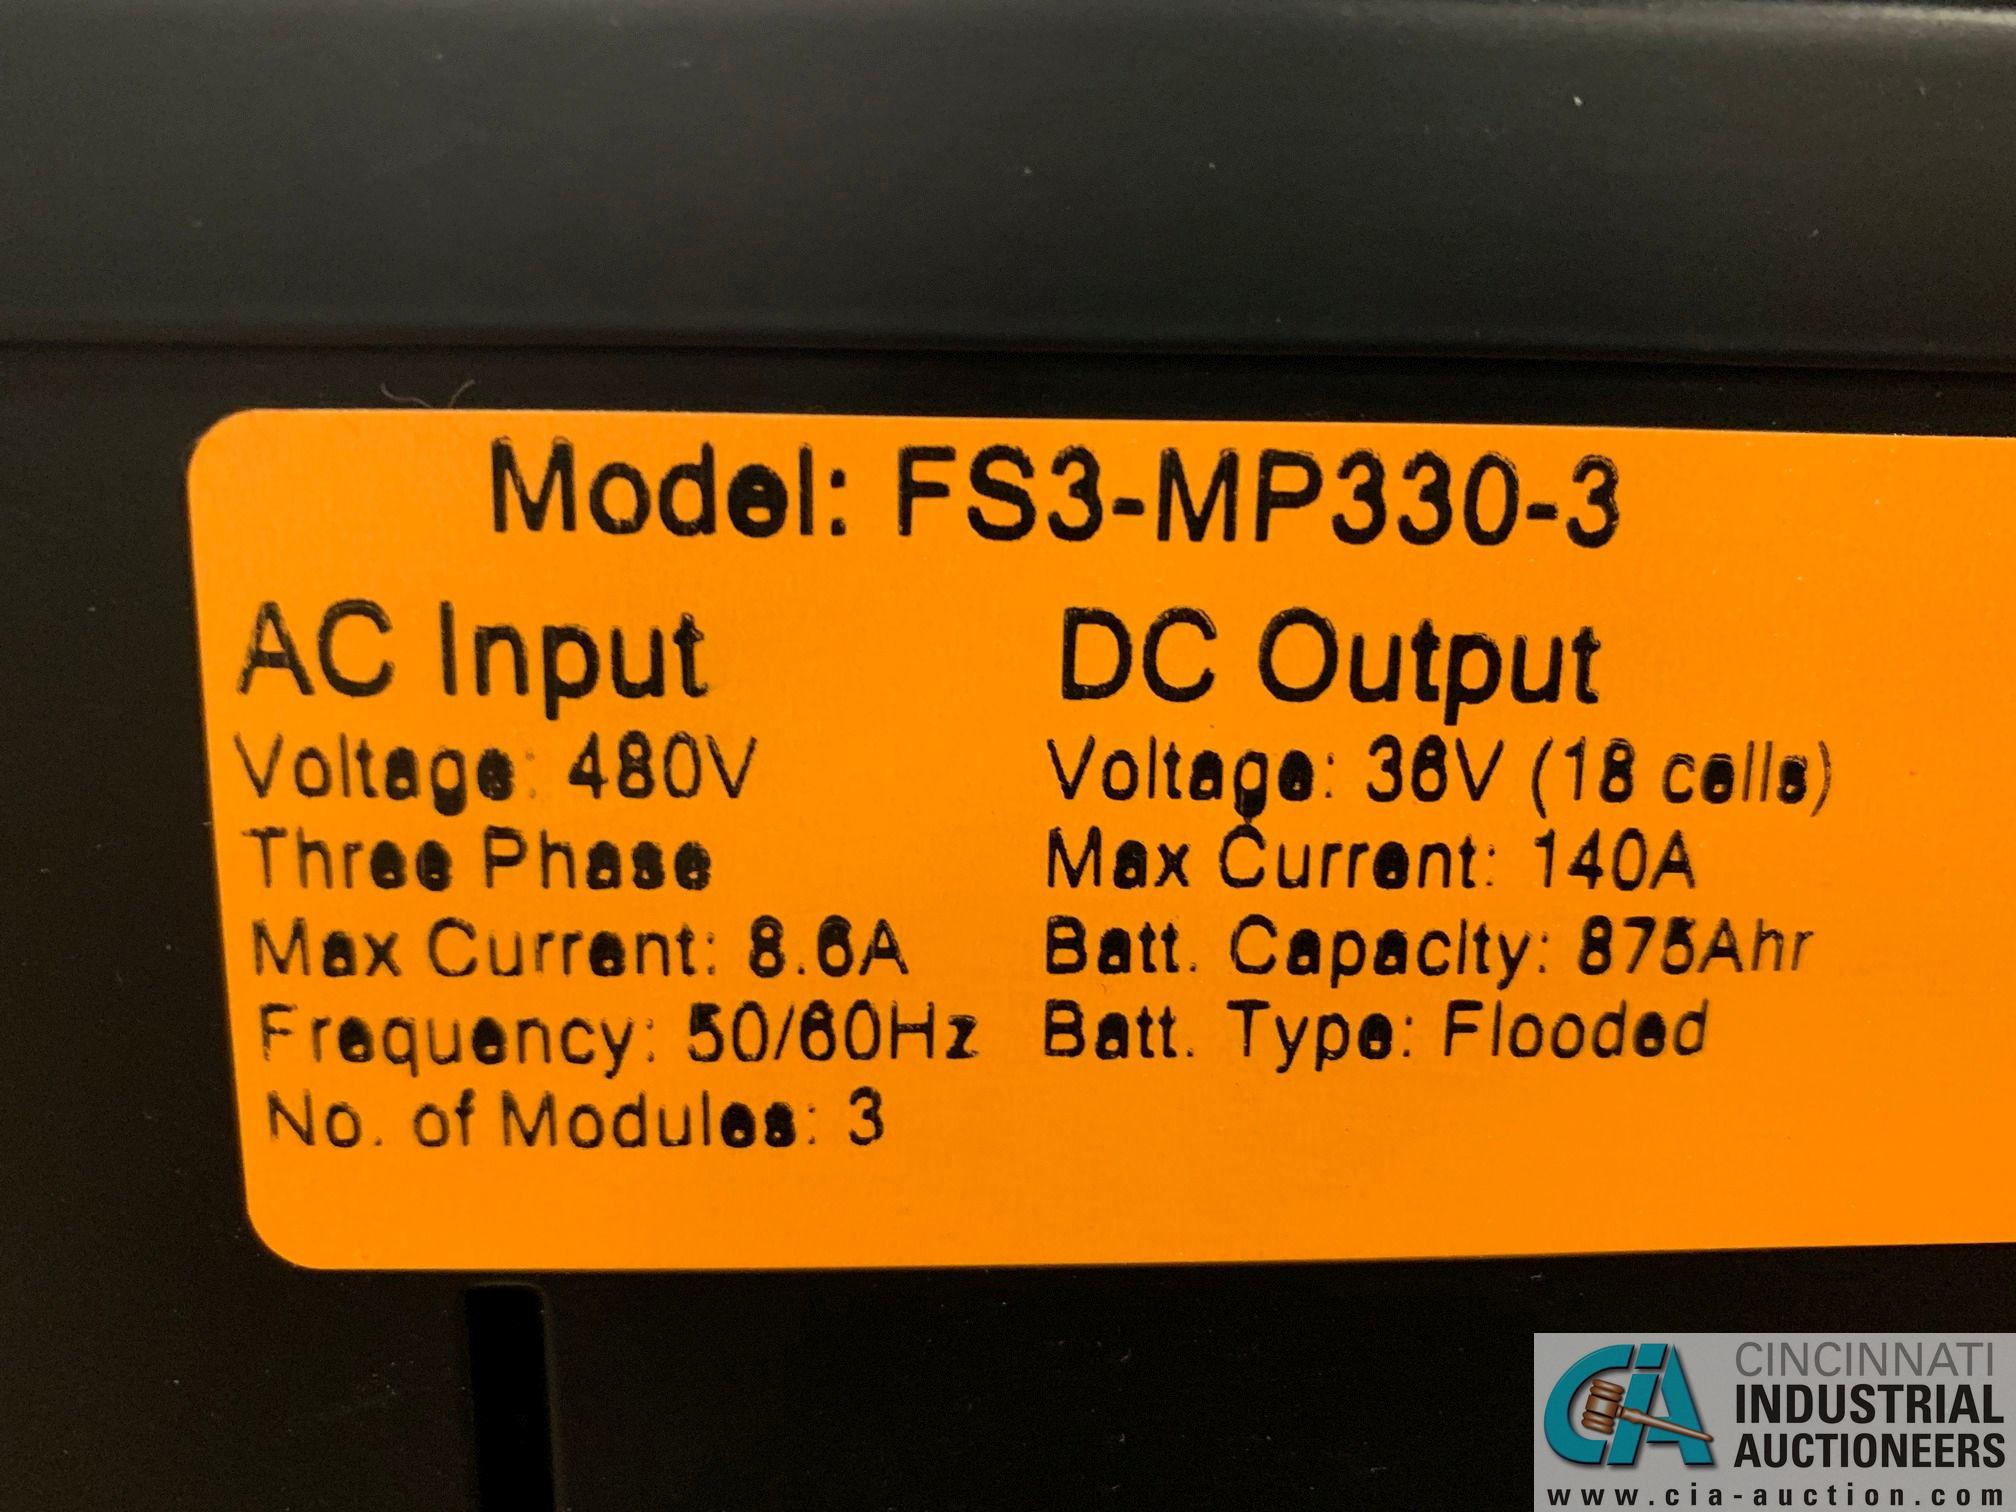 V-FORCE MODEL FS3-MP330-2 BATTERY CHARGER; S/N 3H818099, 36 VOLT, NO STAND - Image 4 of 6